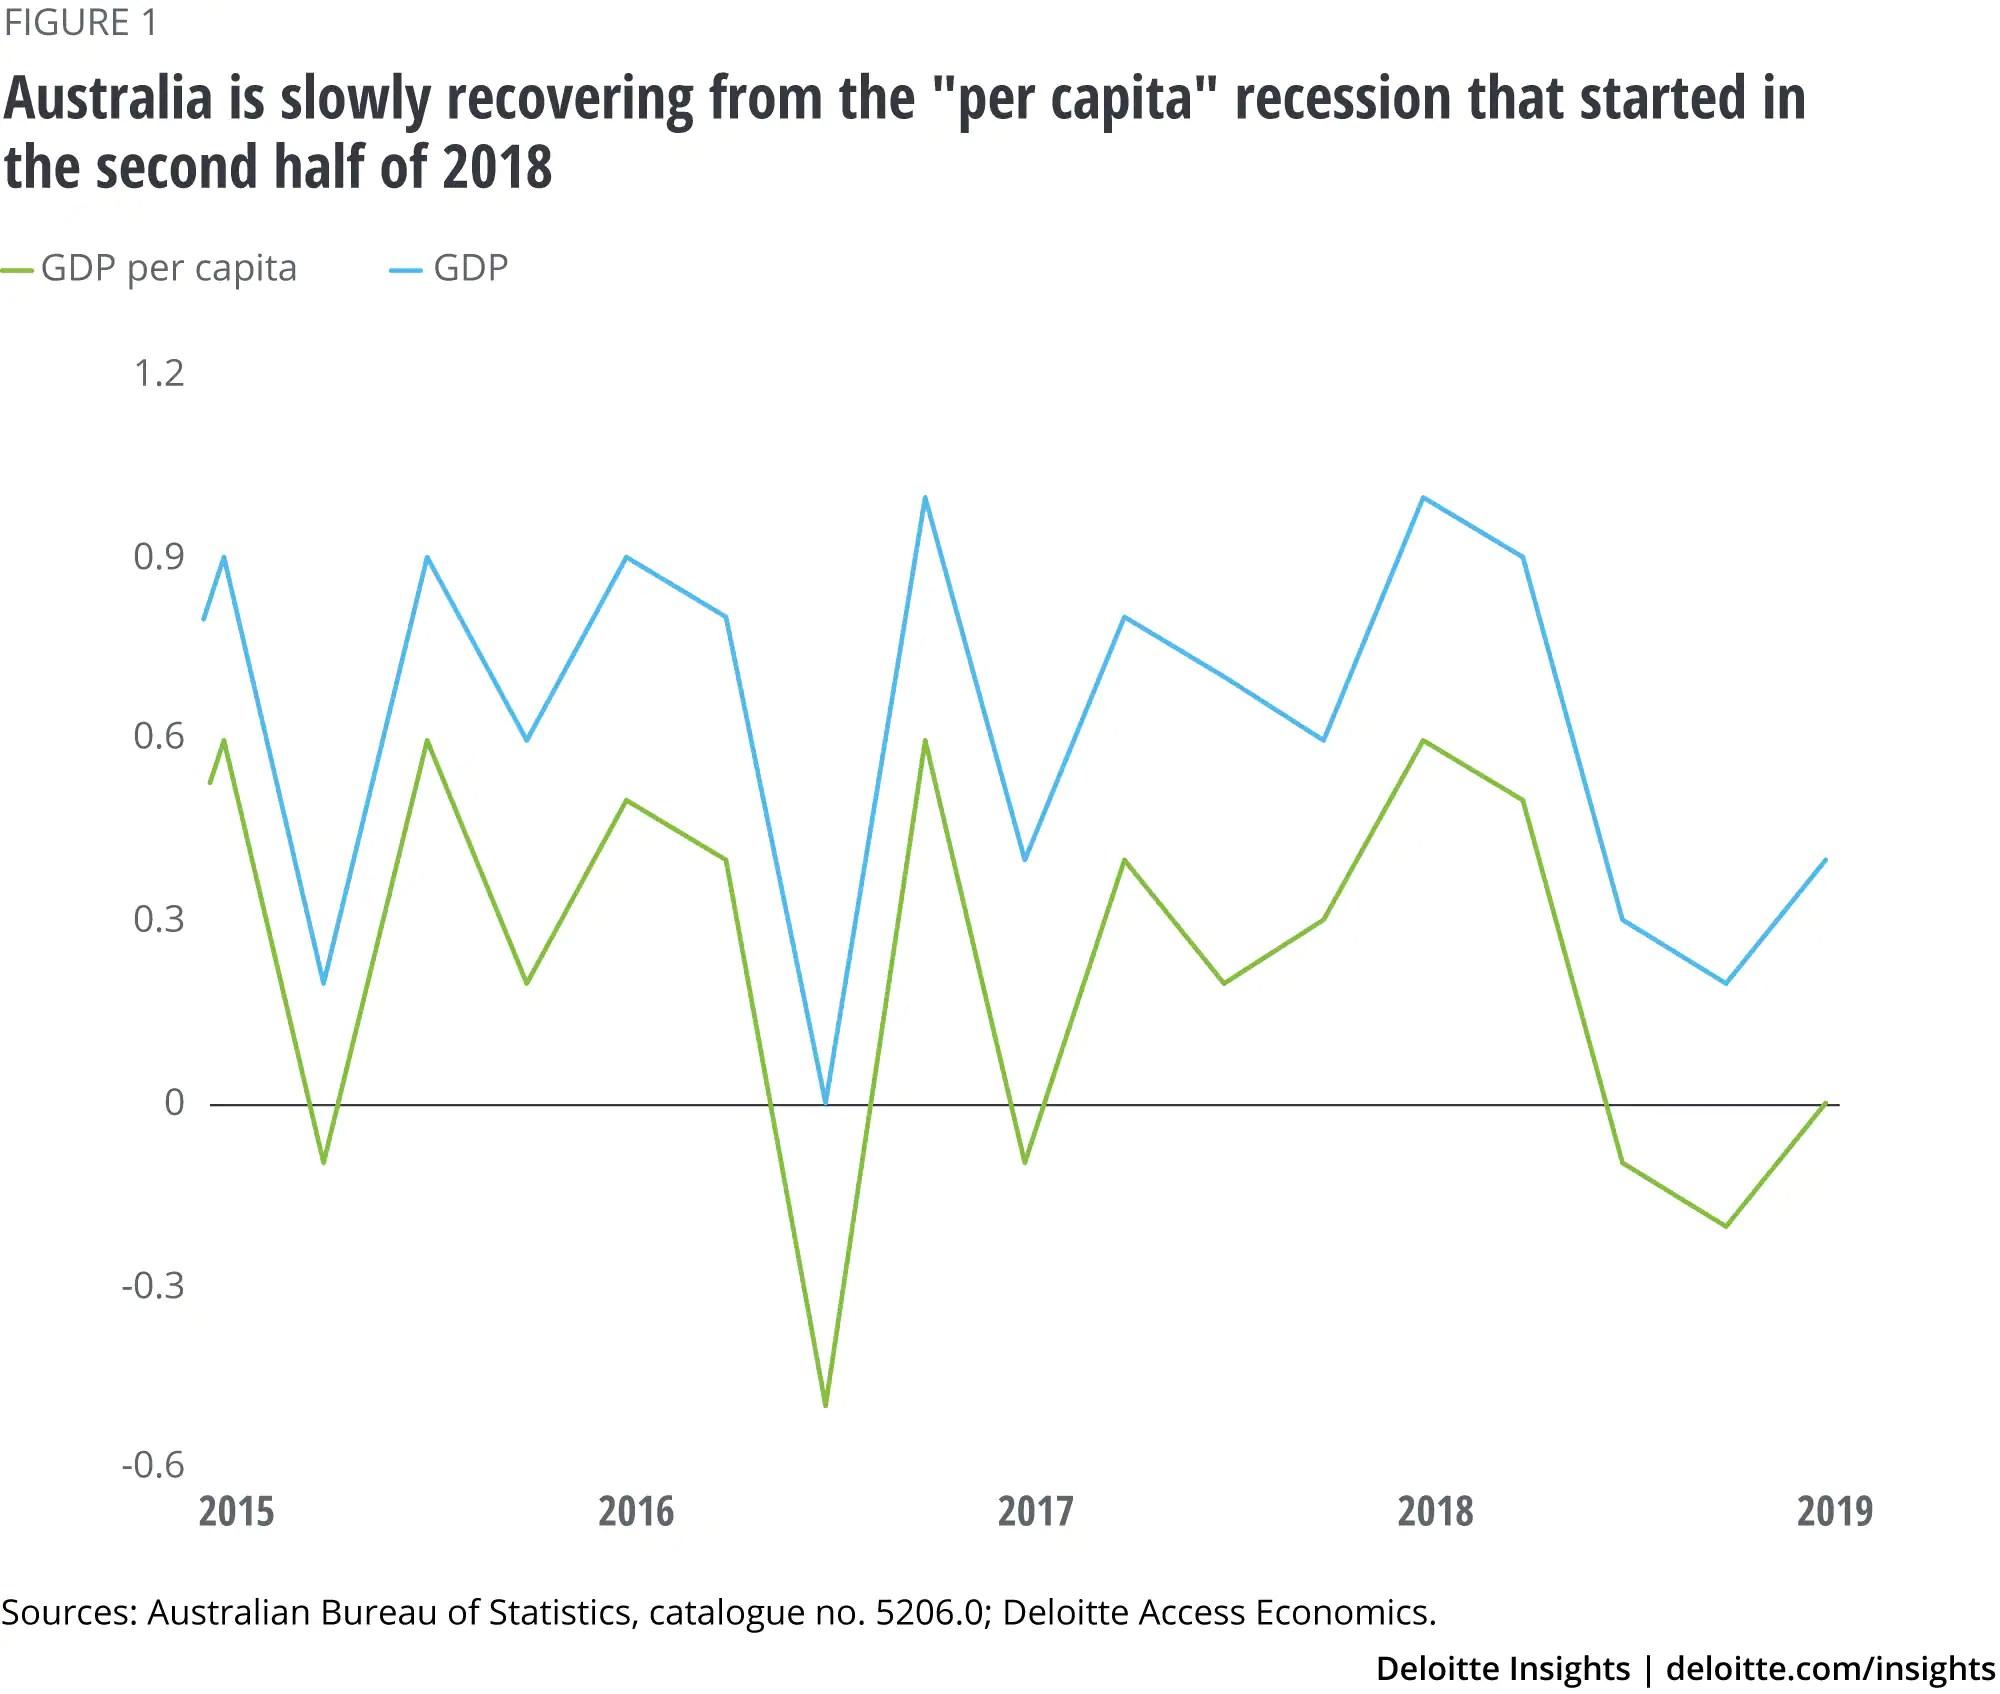 Australia Economic Outlook | Deloitte Insights